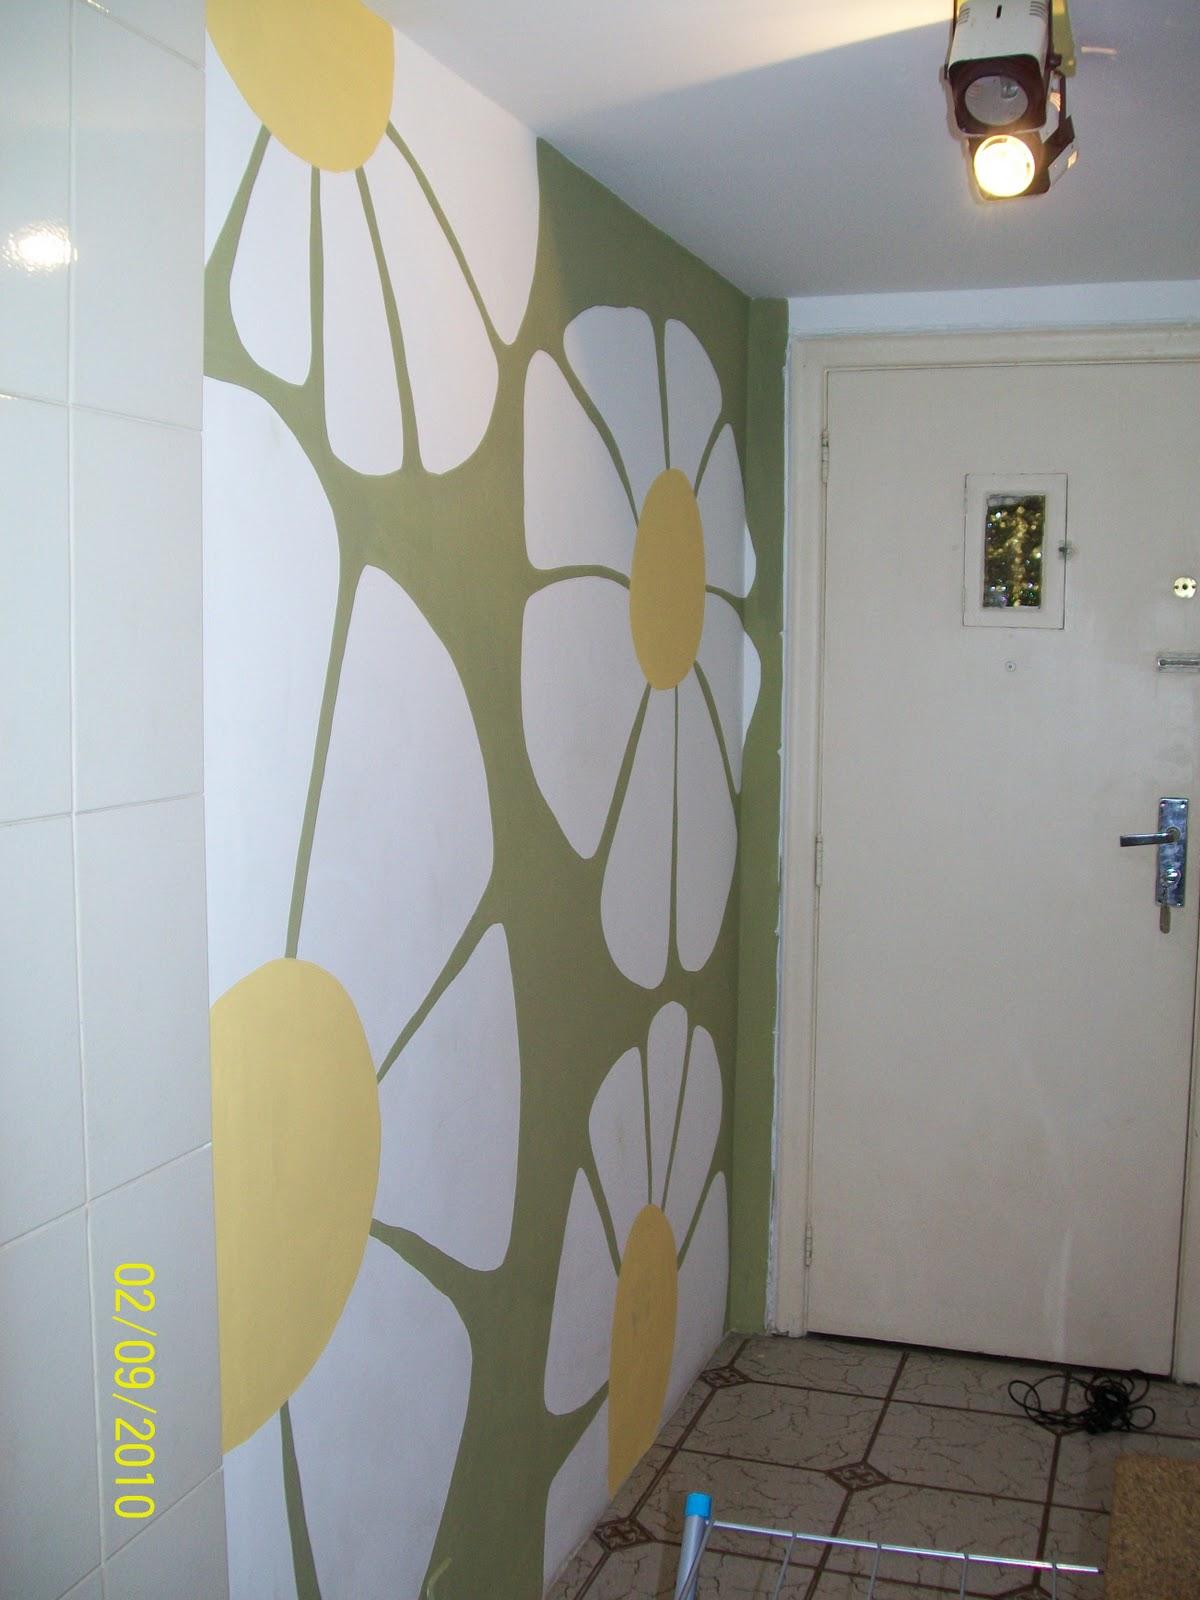 L pis tinta colorido pinturas de parede decorativas - Pintura decorativa para paredes ...